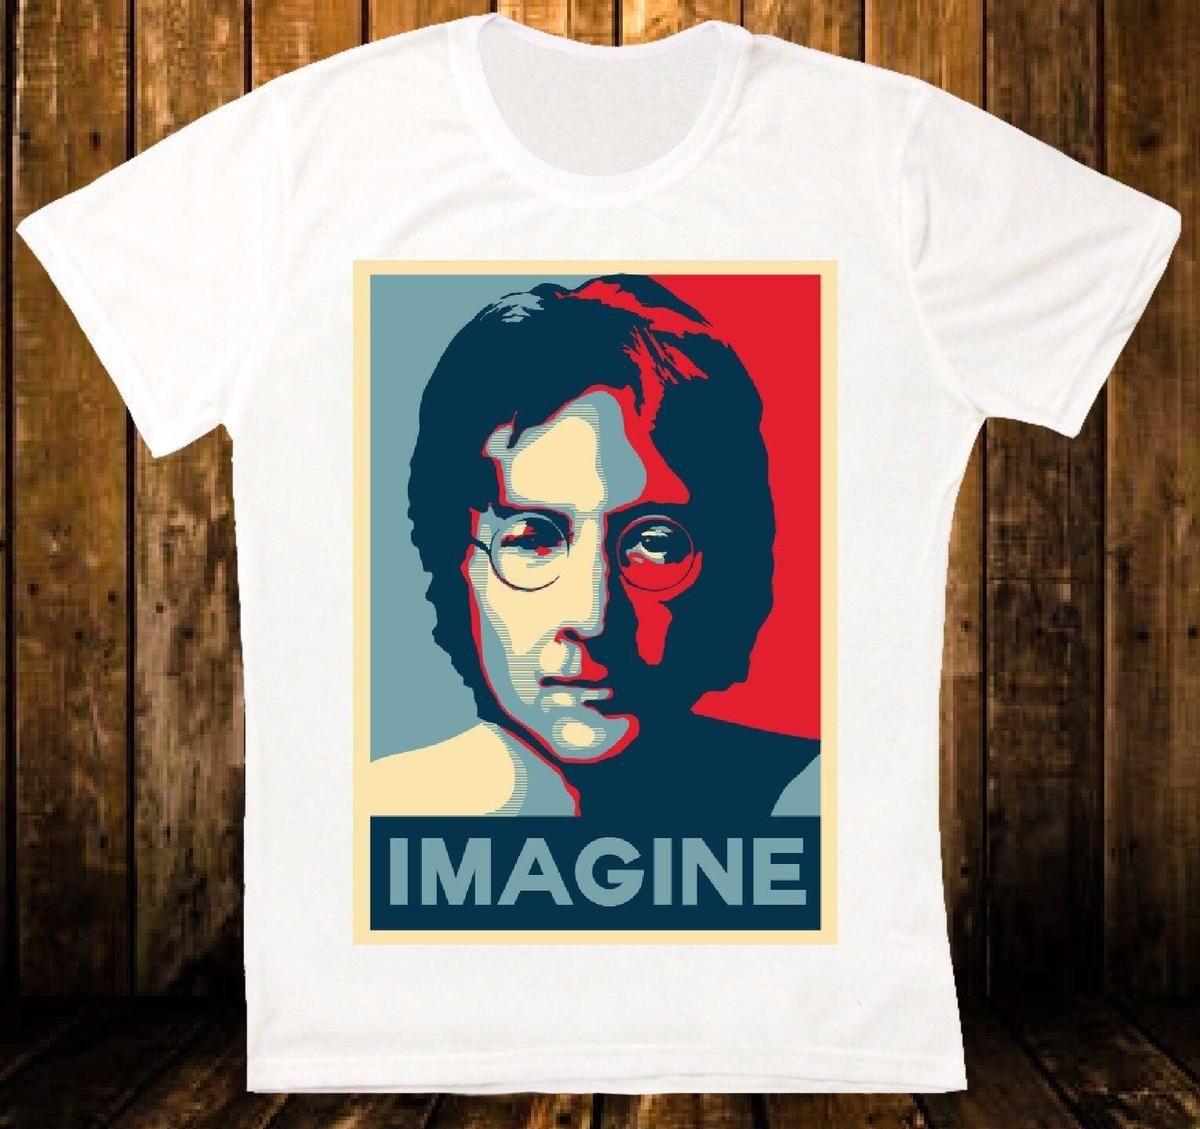 Compre JOHN LENNON IMAGINE Retro Vintage Hipster Camiseta Unisex Camiseta  Hombre Negro Manga Corta Algodón Hip Hop Camiseta Imprimir Camisetas A   12.08 Del ... 734eda93d17